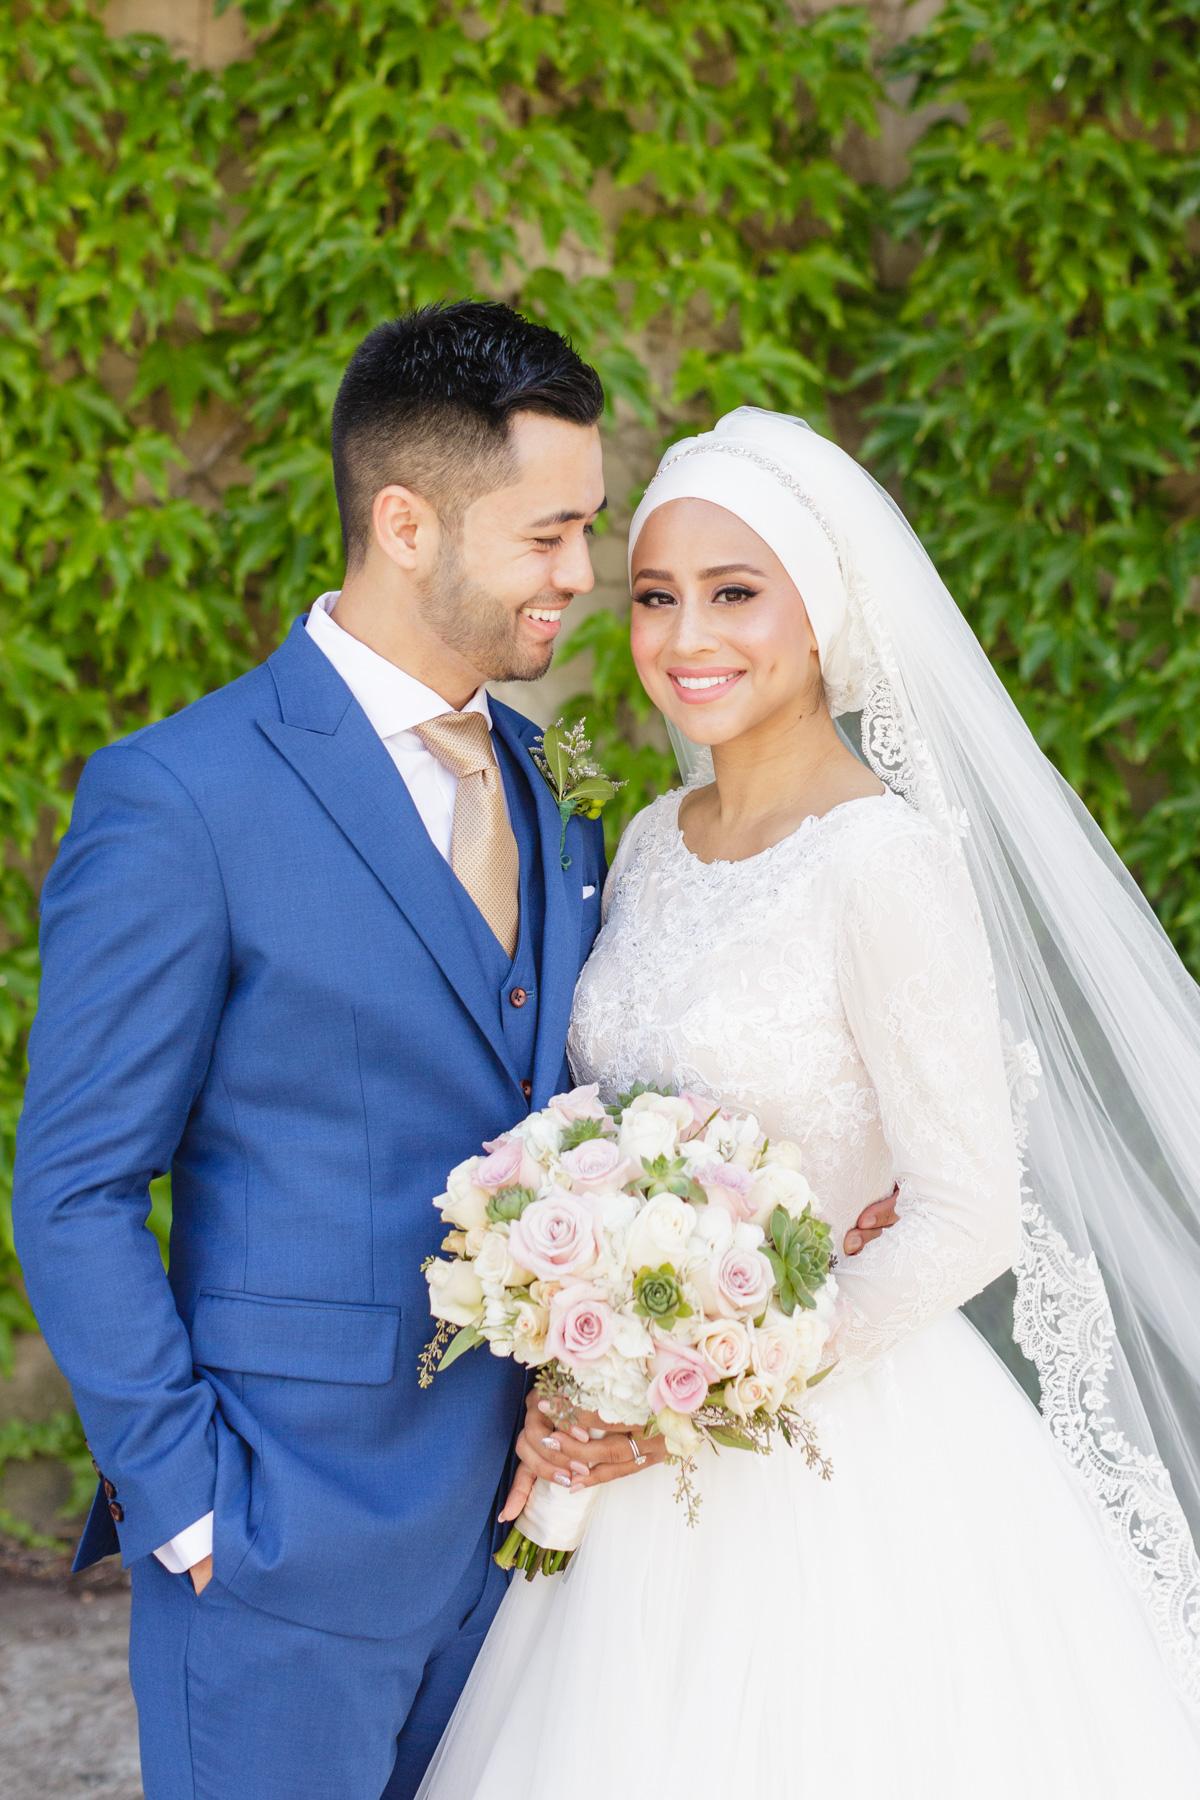 joeewong-ayad-liberty-grand-toronto-wedding-211